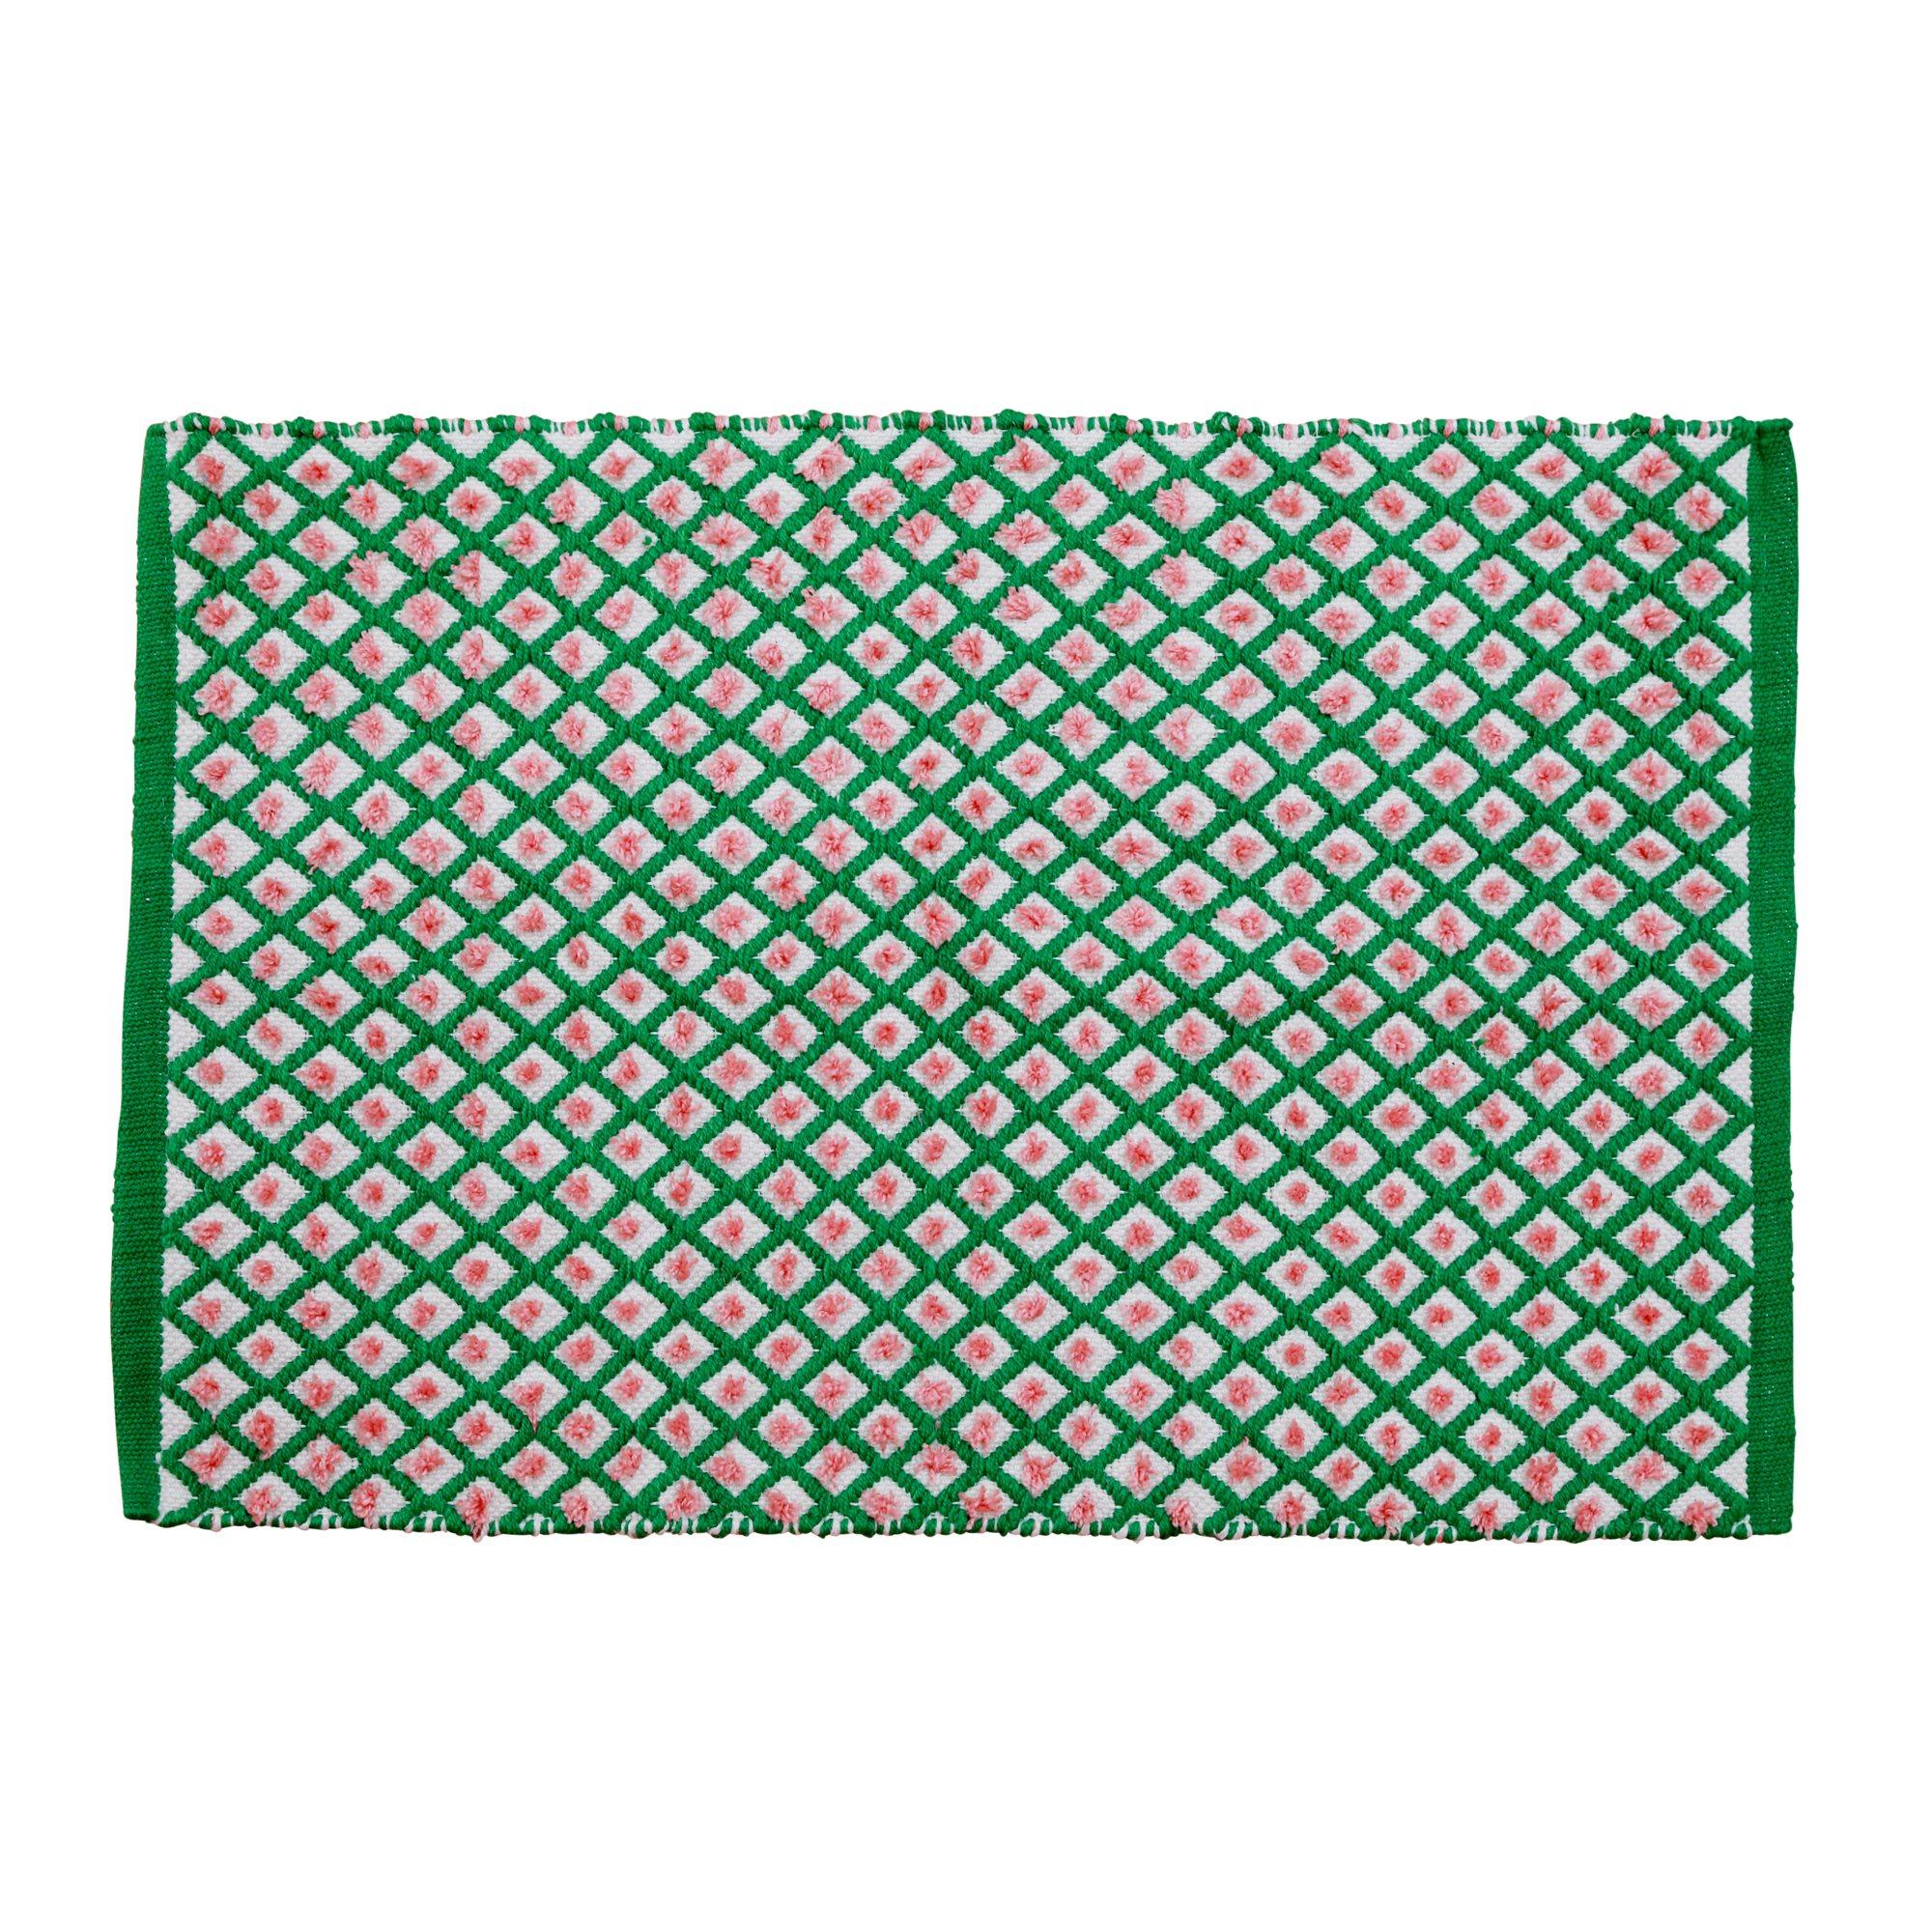 Rice - Handmade Recycled Plastic Floormat 60 x 90 cm - Green Harlequin